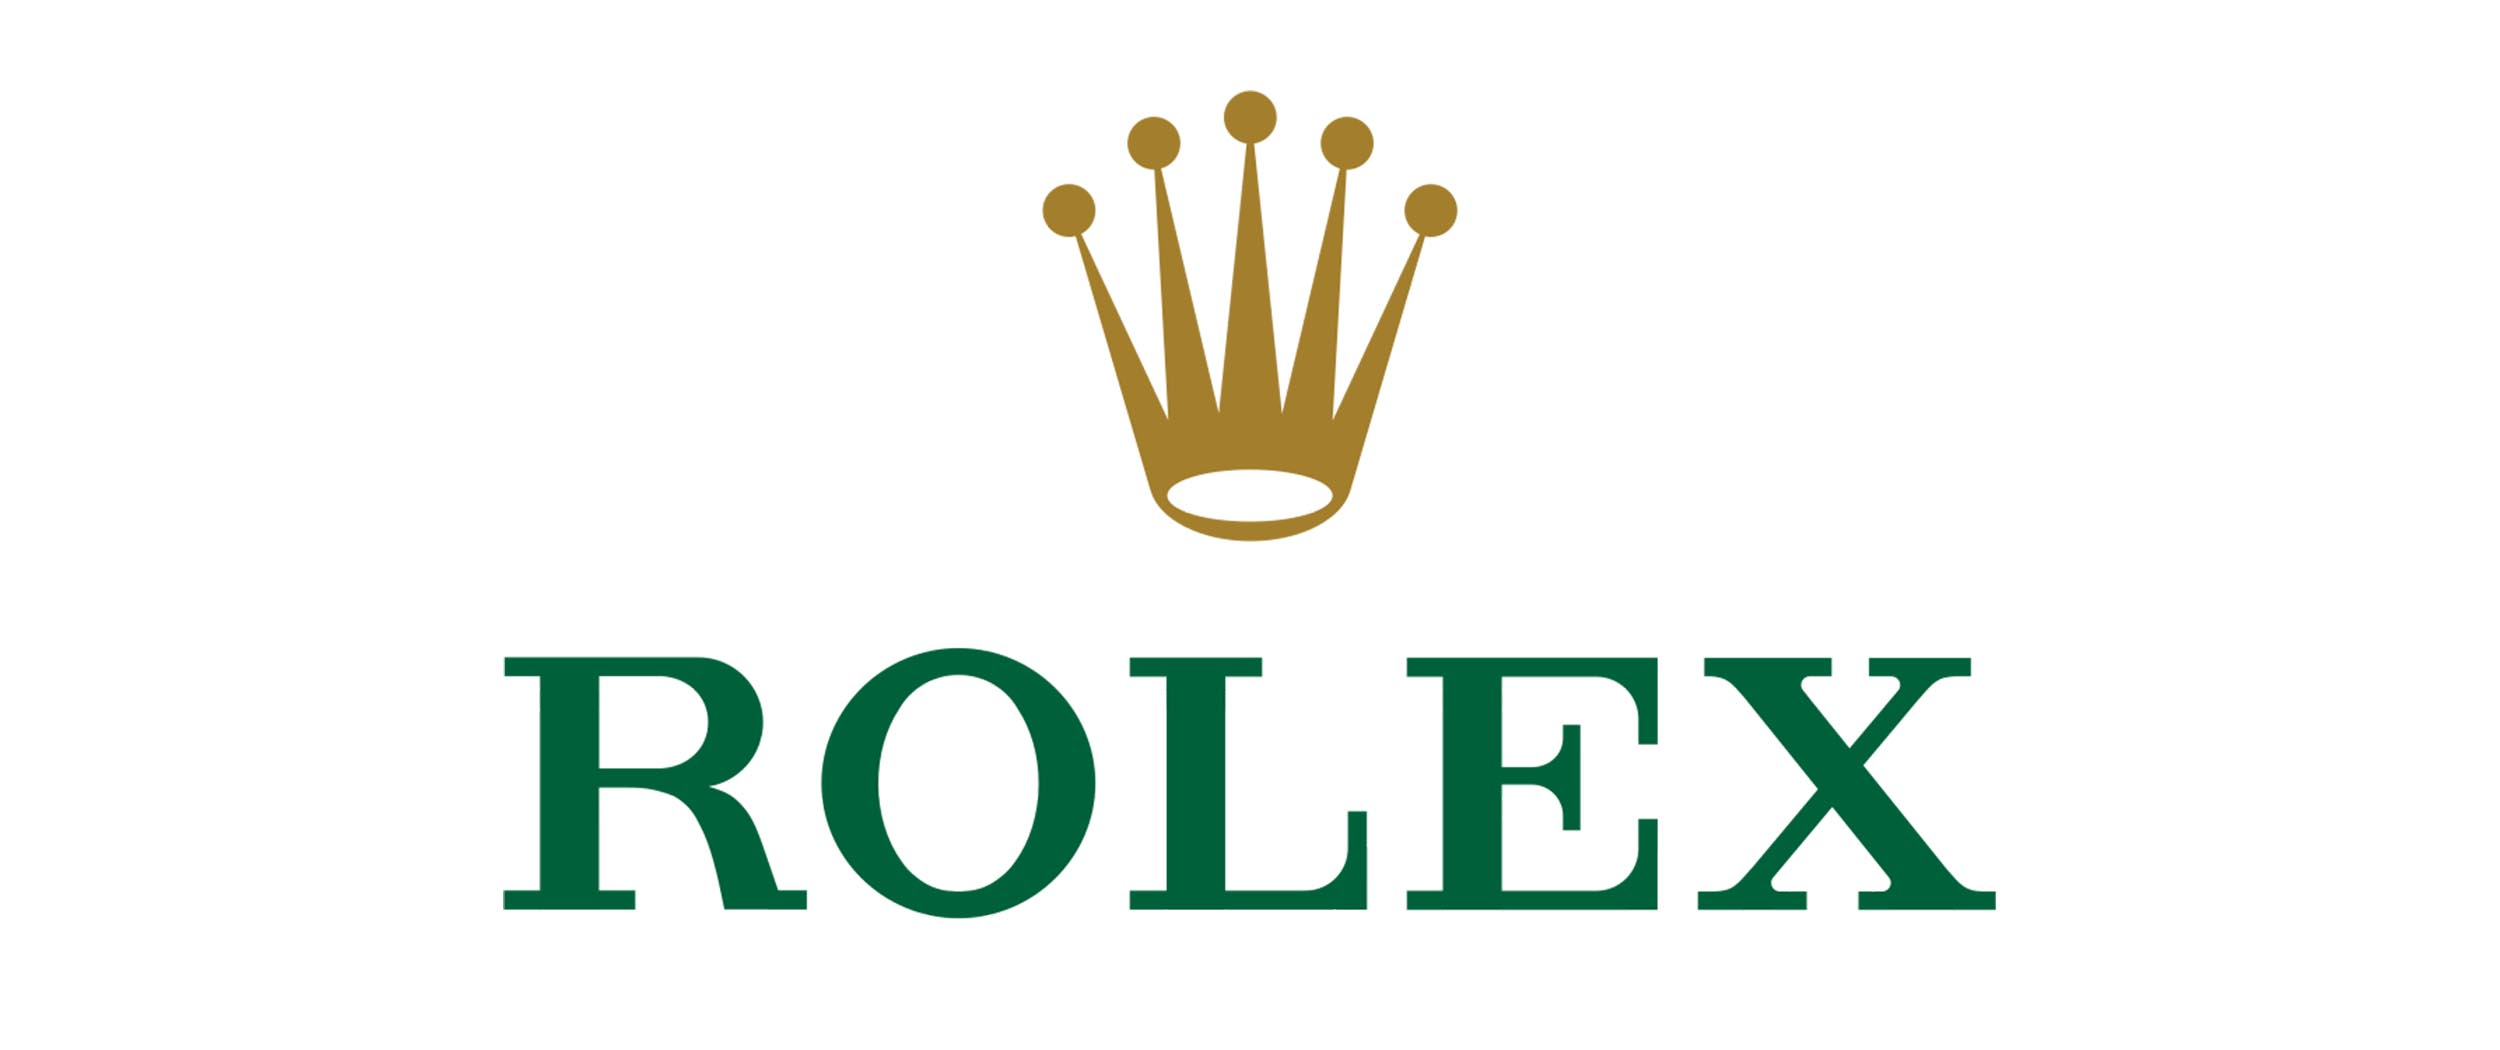 4 Rolex.jpg